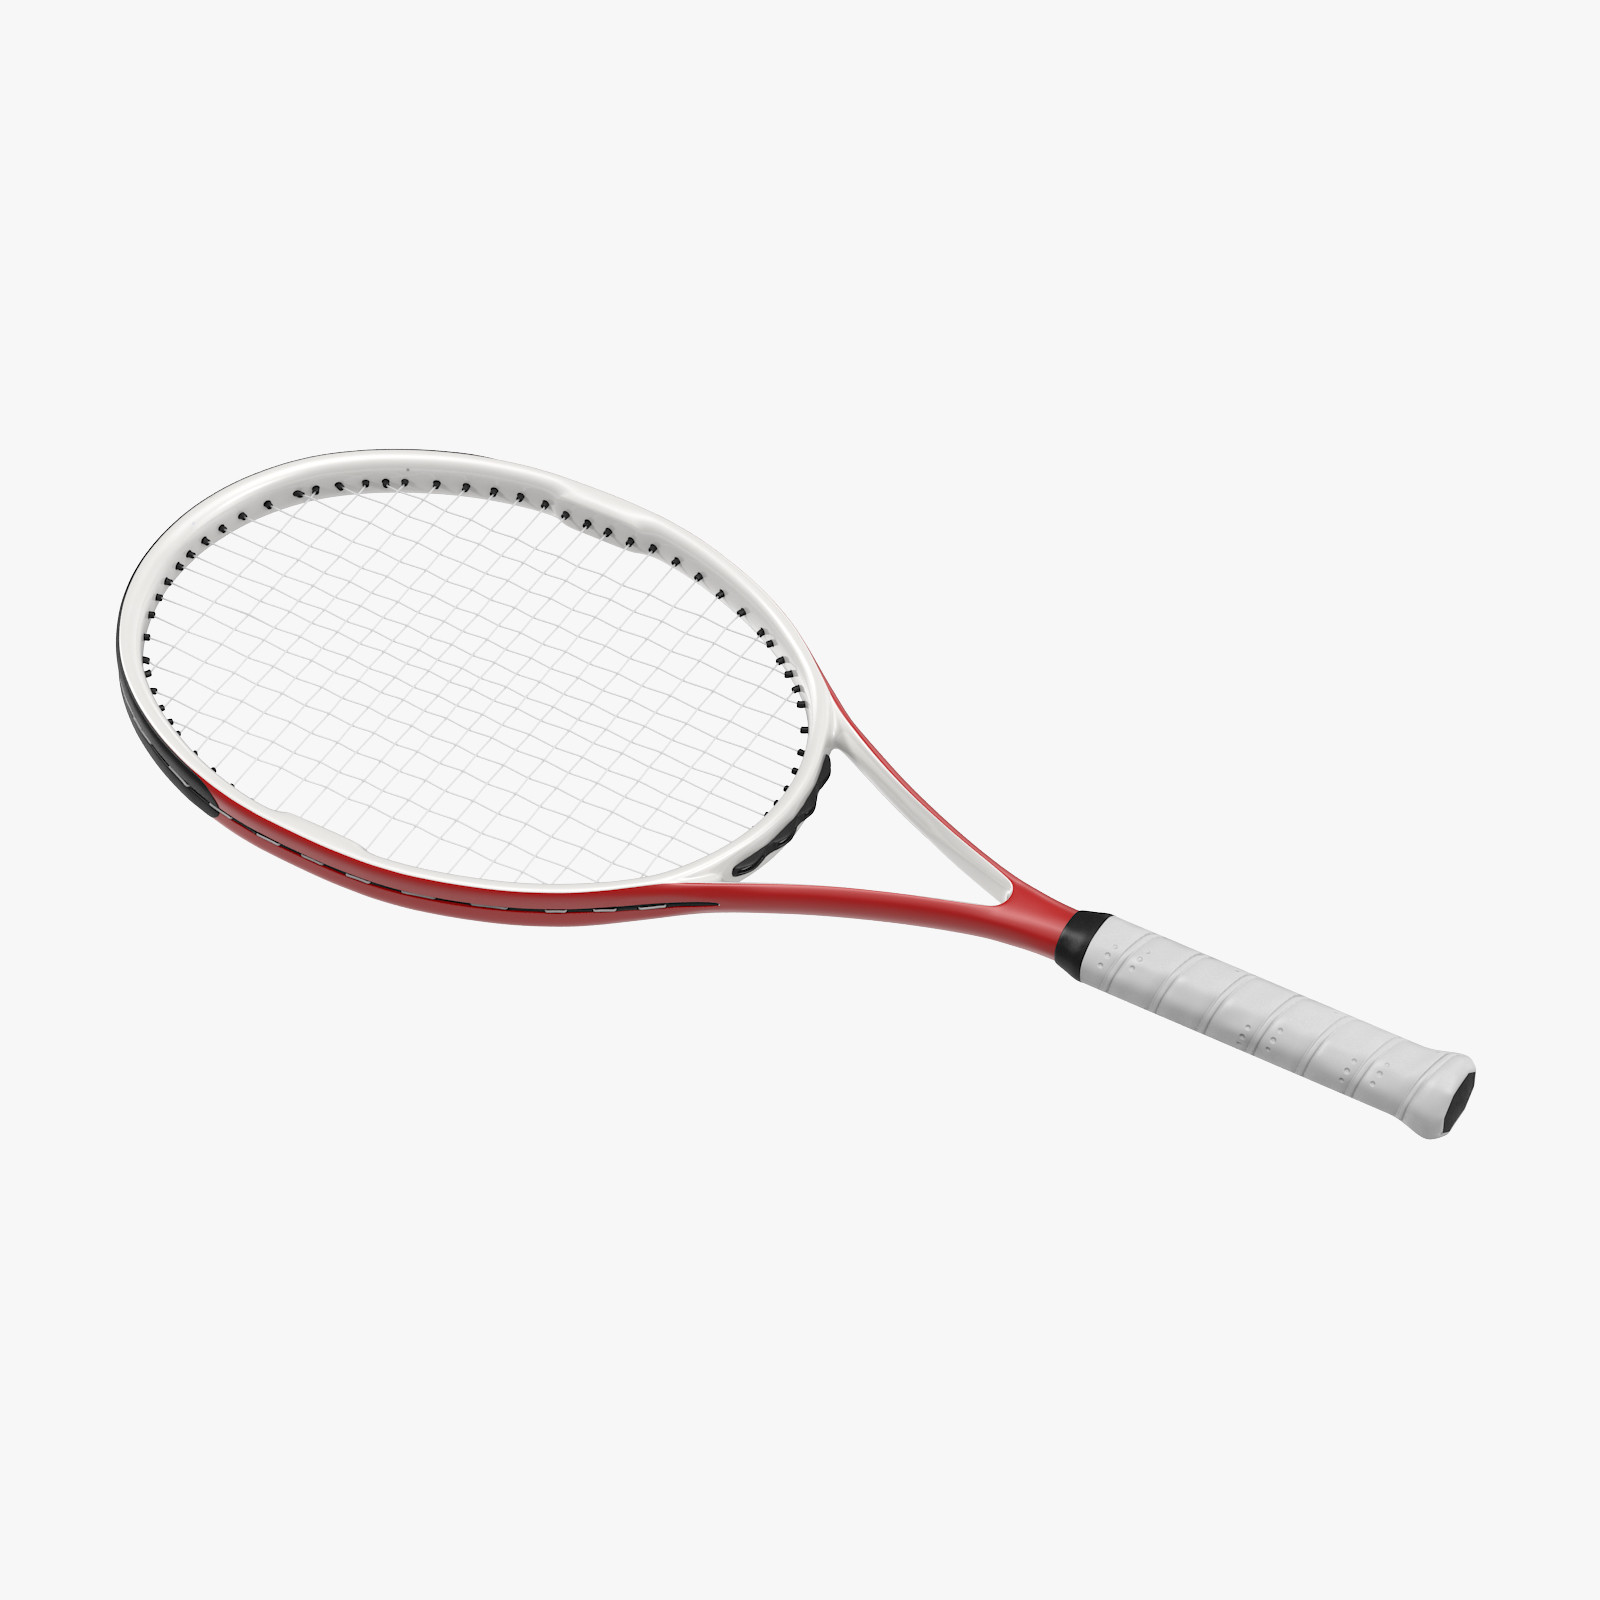 Tennis_Racket_01_Thumbnail_Square0000.jpg